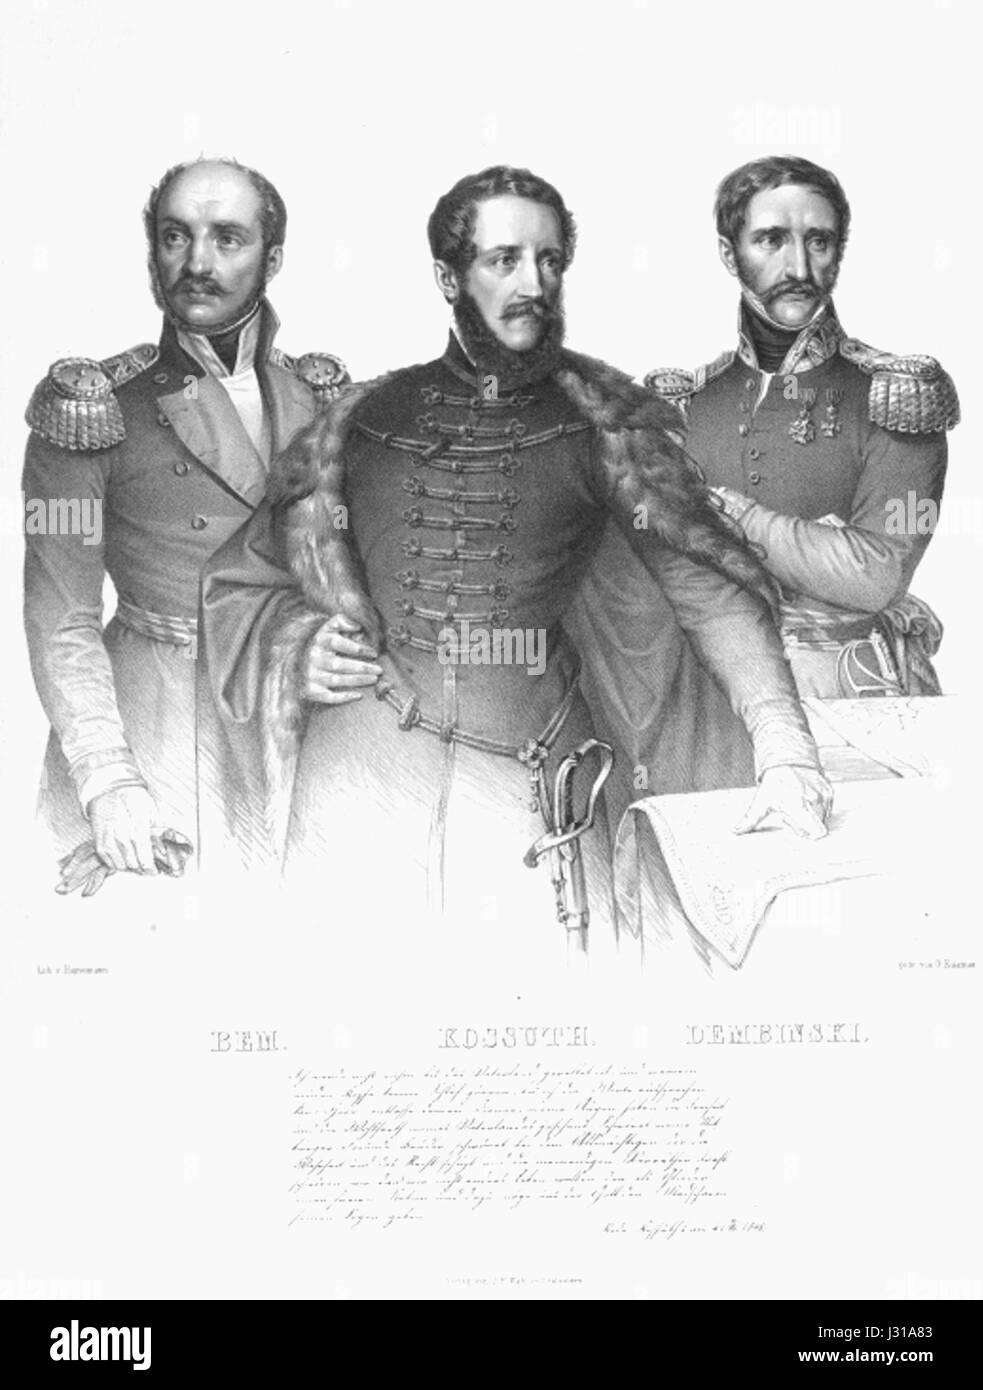 Bem - Kossuth - Dembinsky - Stock Image